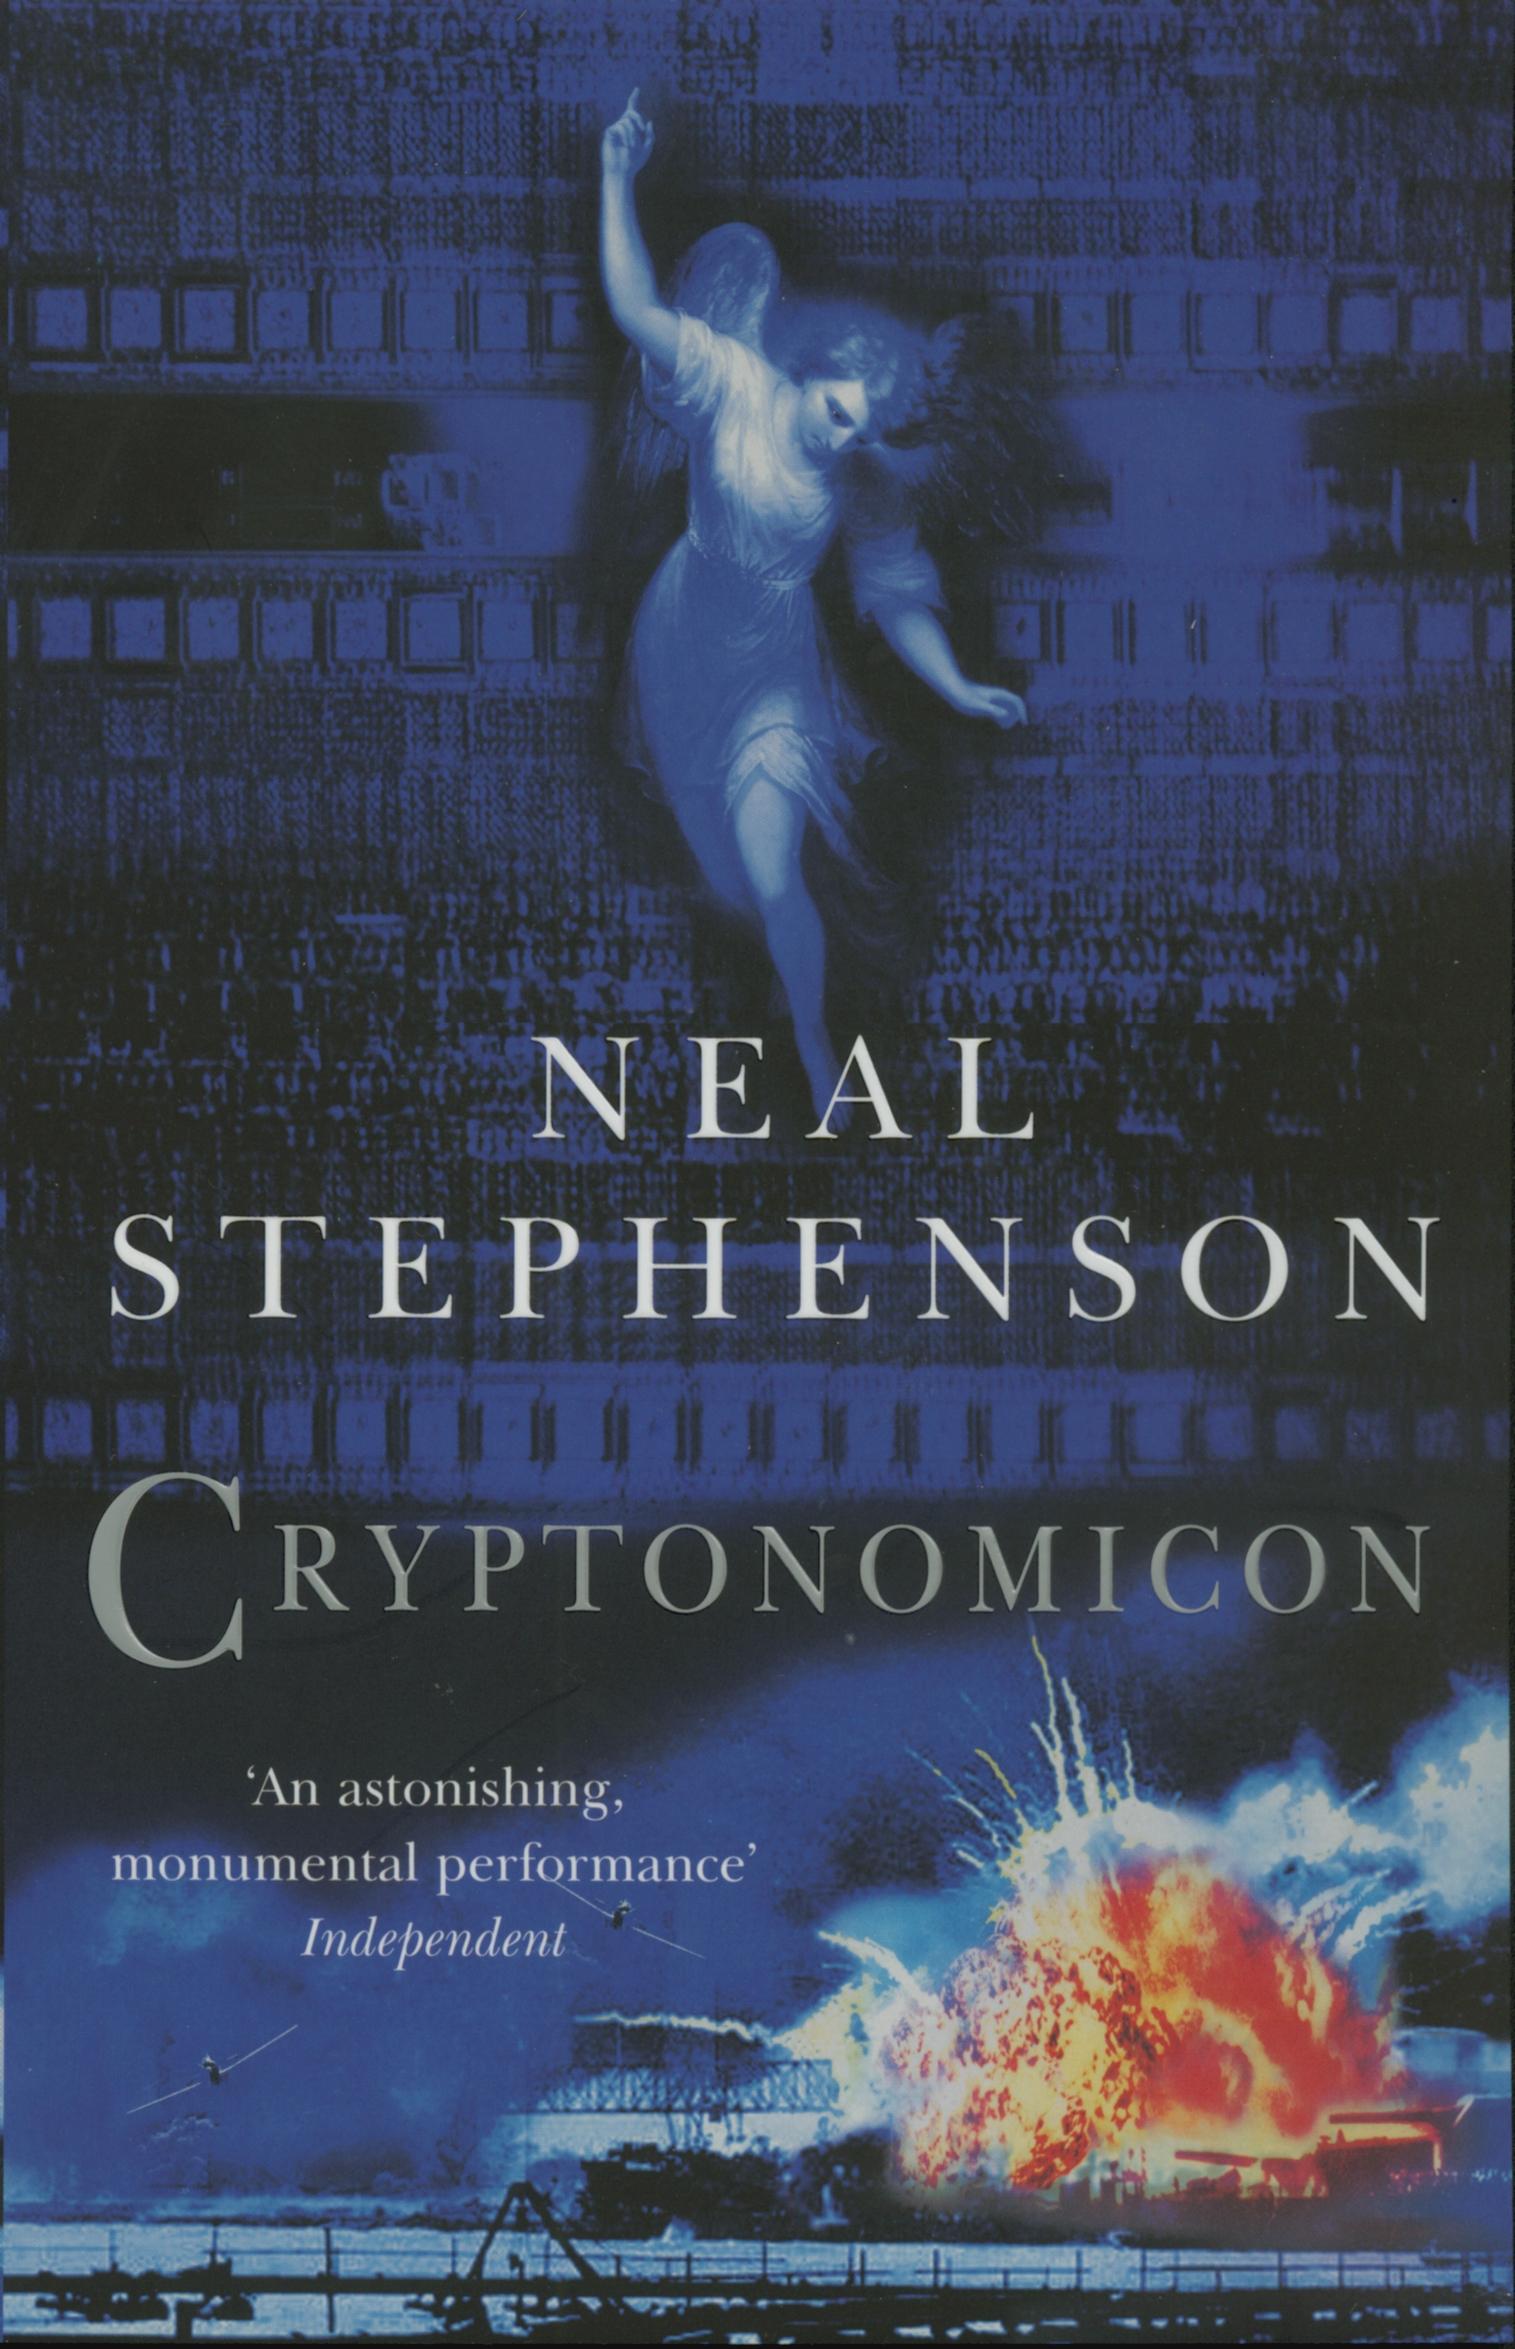 Neal Stephenson - Cryptonomicon (Kindle Edition) - 99p @ Amazon UK